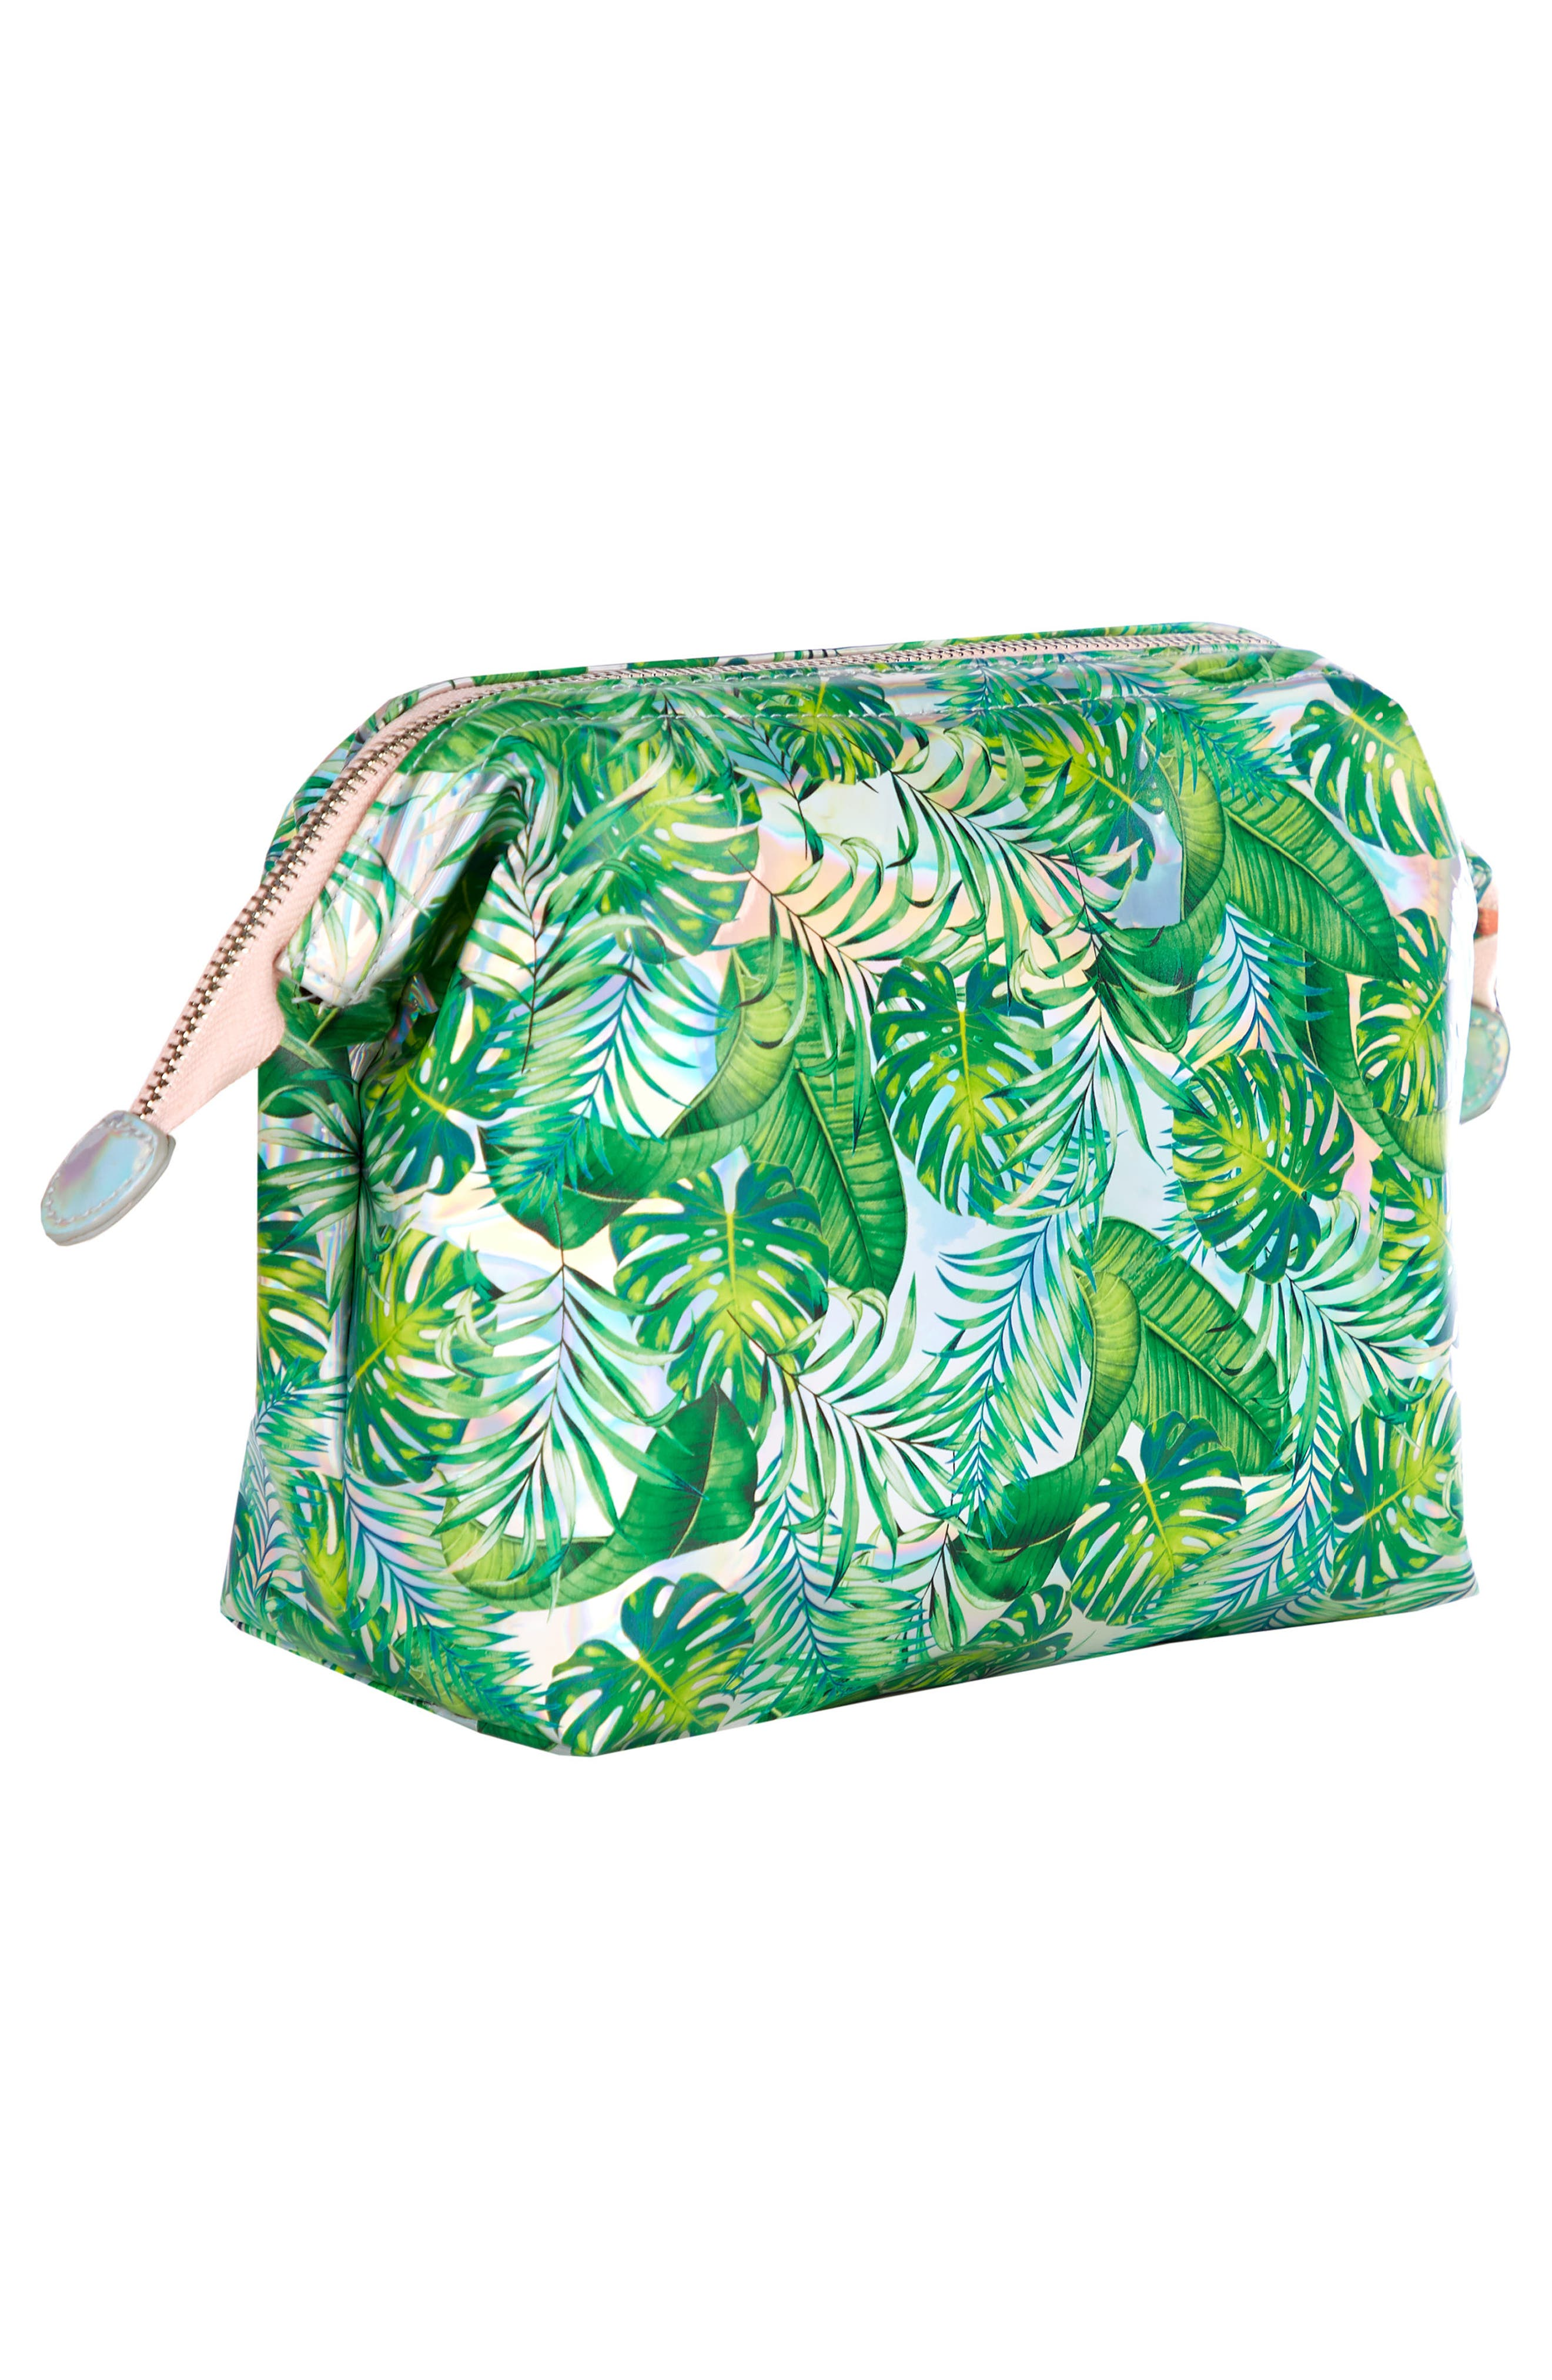 Skinny Dip Dominica Large Cosmetics Case,                             Alternate thumbnail 2, color,                             000